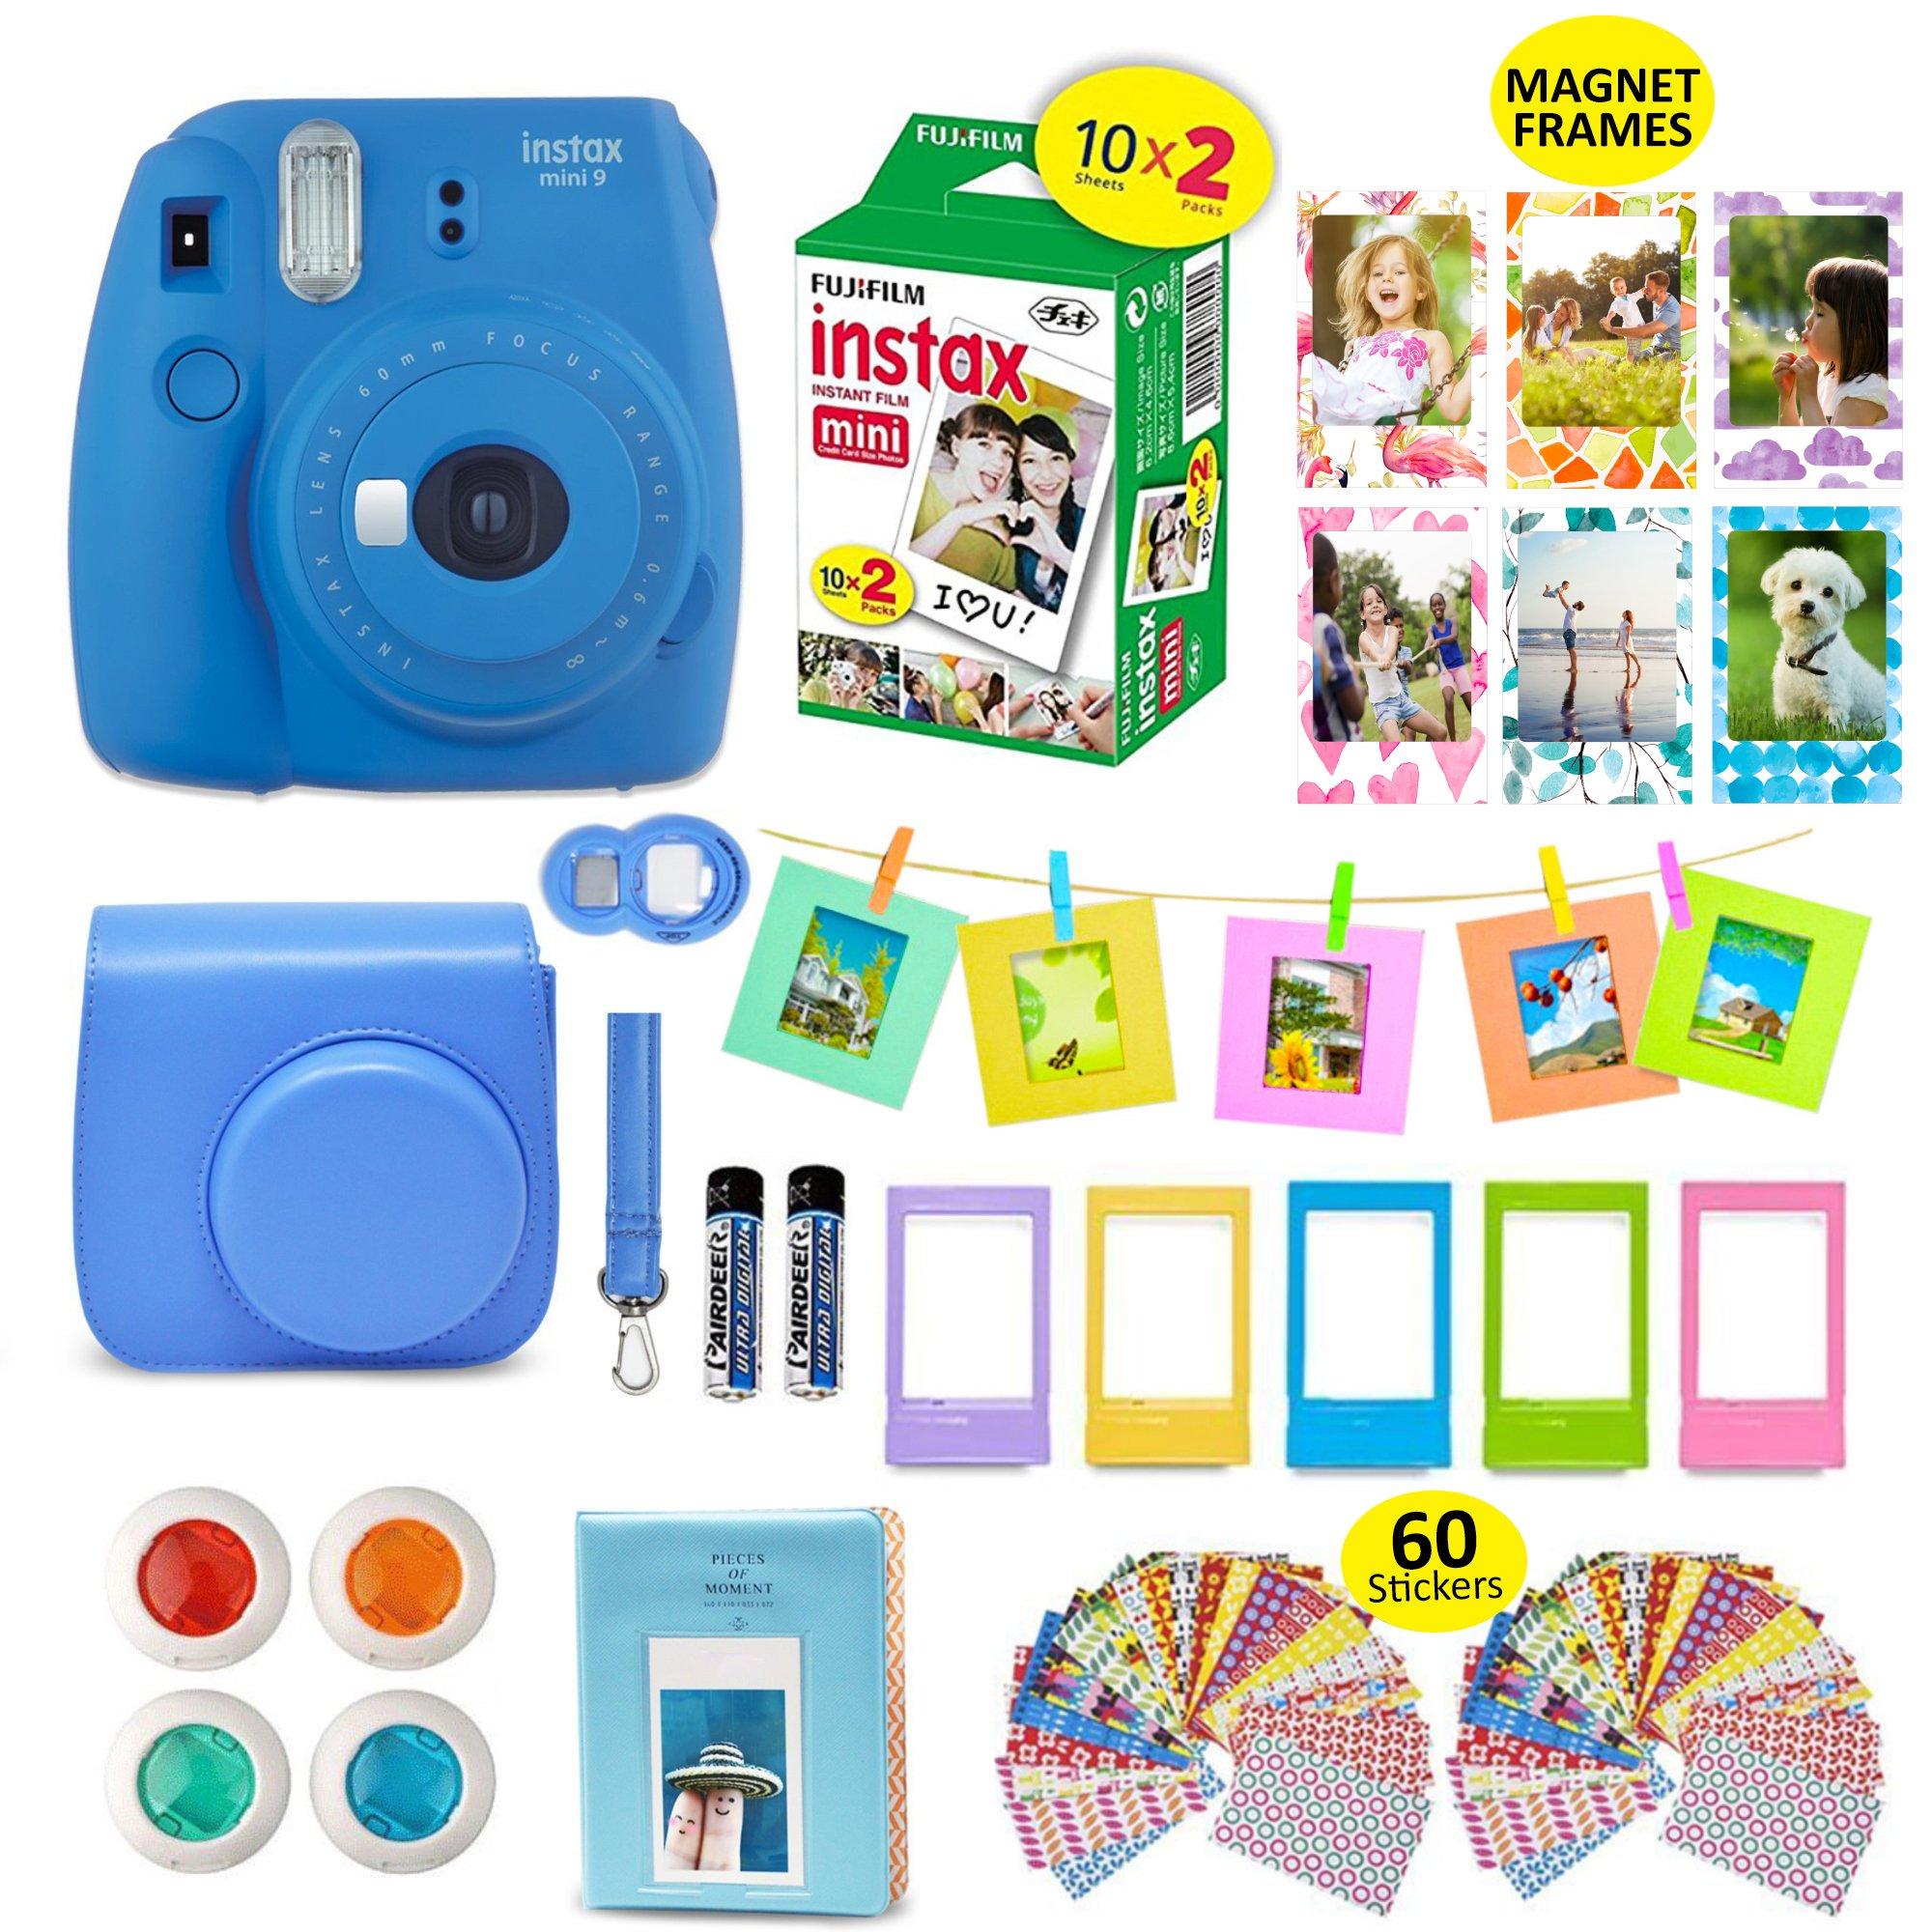 Fujifilm Instax Mini 9 Camera COBALT BLUE Camera + 20 Instant Fuji-Film Shots, Instax Case + 14 PC Instax Accessories Bundle, Fuji Mini 9 Kit Gift, Albums, Lenses, 60 Stickers + Frames by Shutter by Shutter